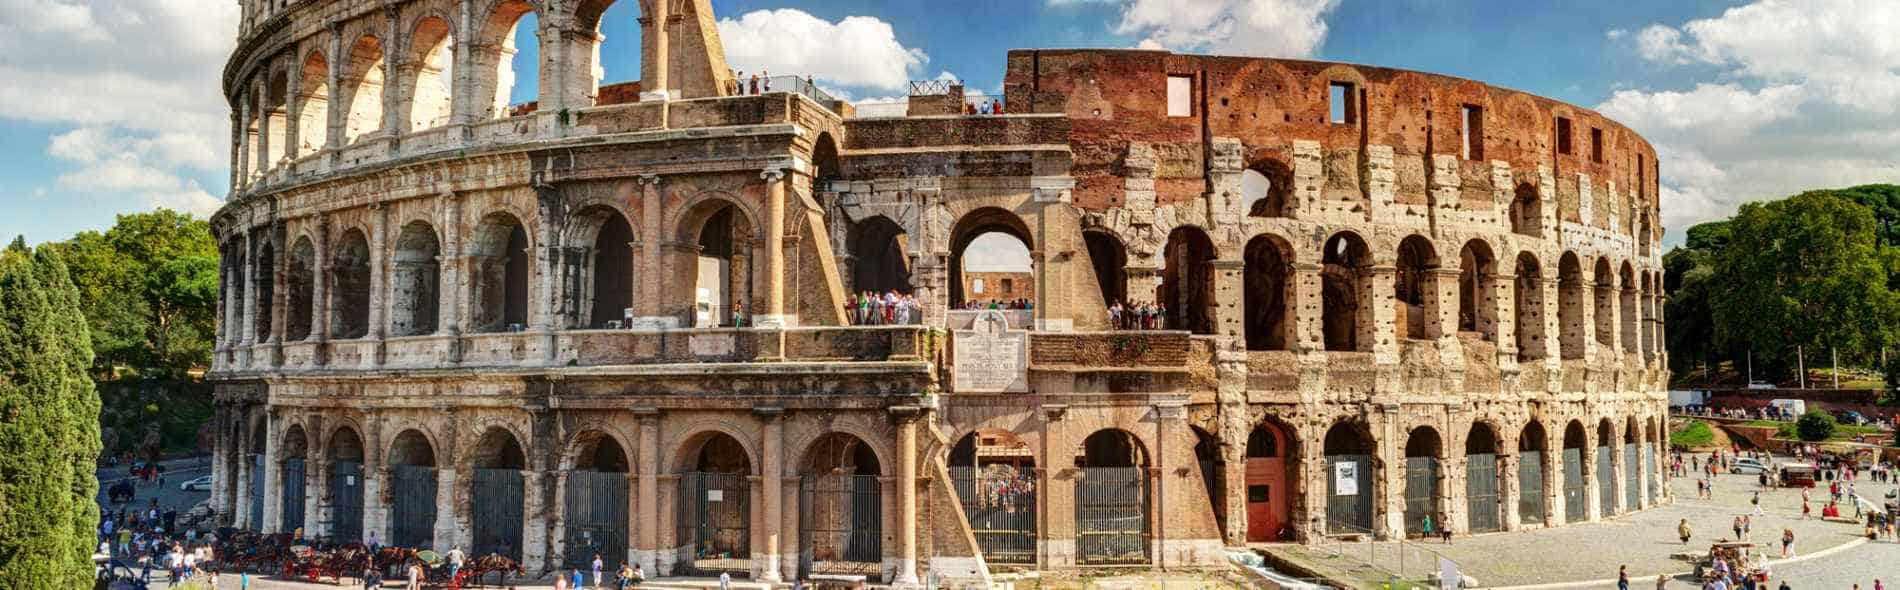 evolved-guide-rome-tours-colosseum-roman-forum-palatine-hill-tour